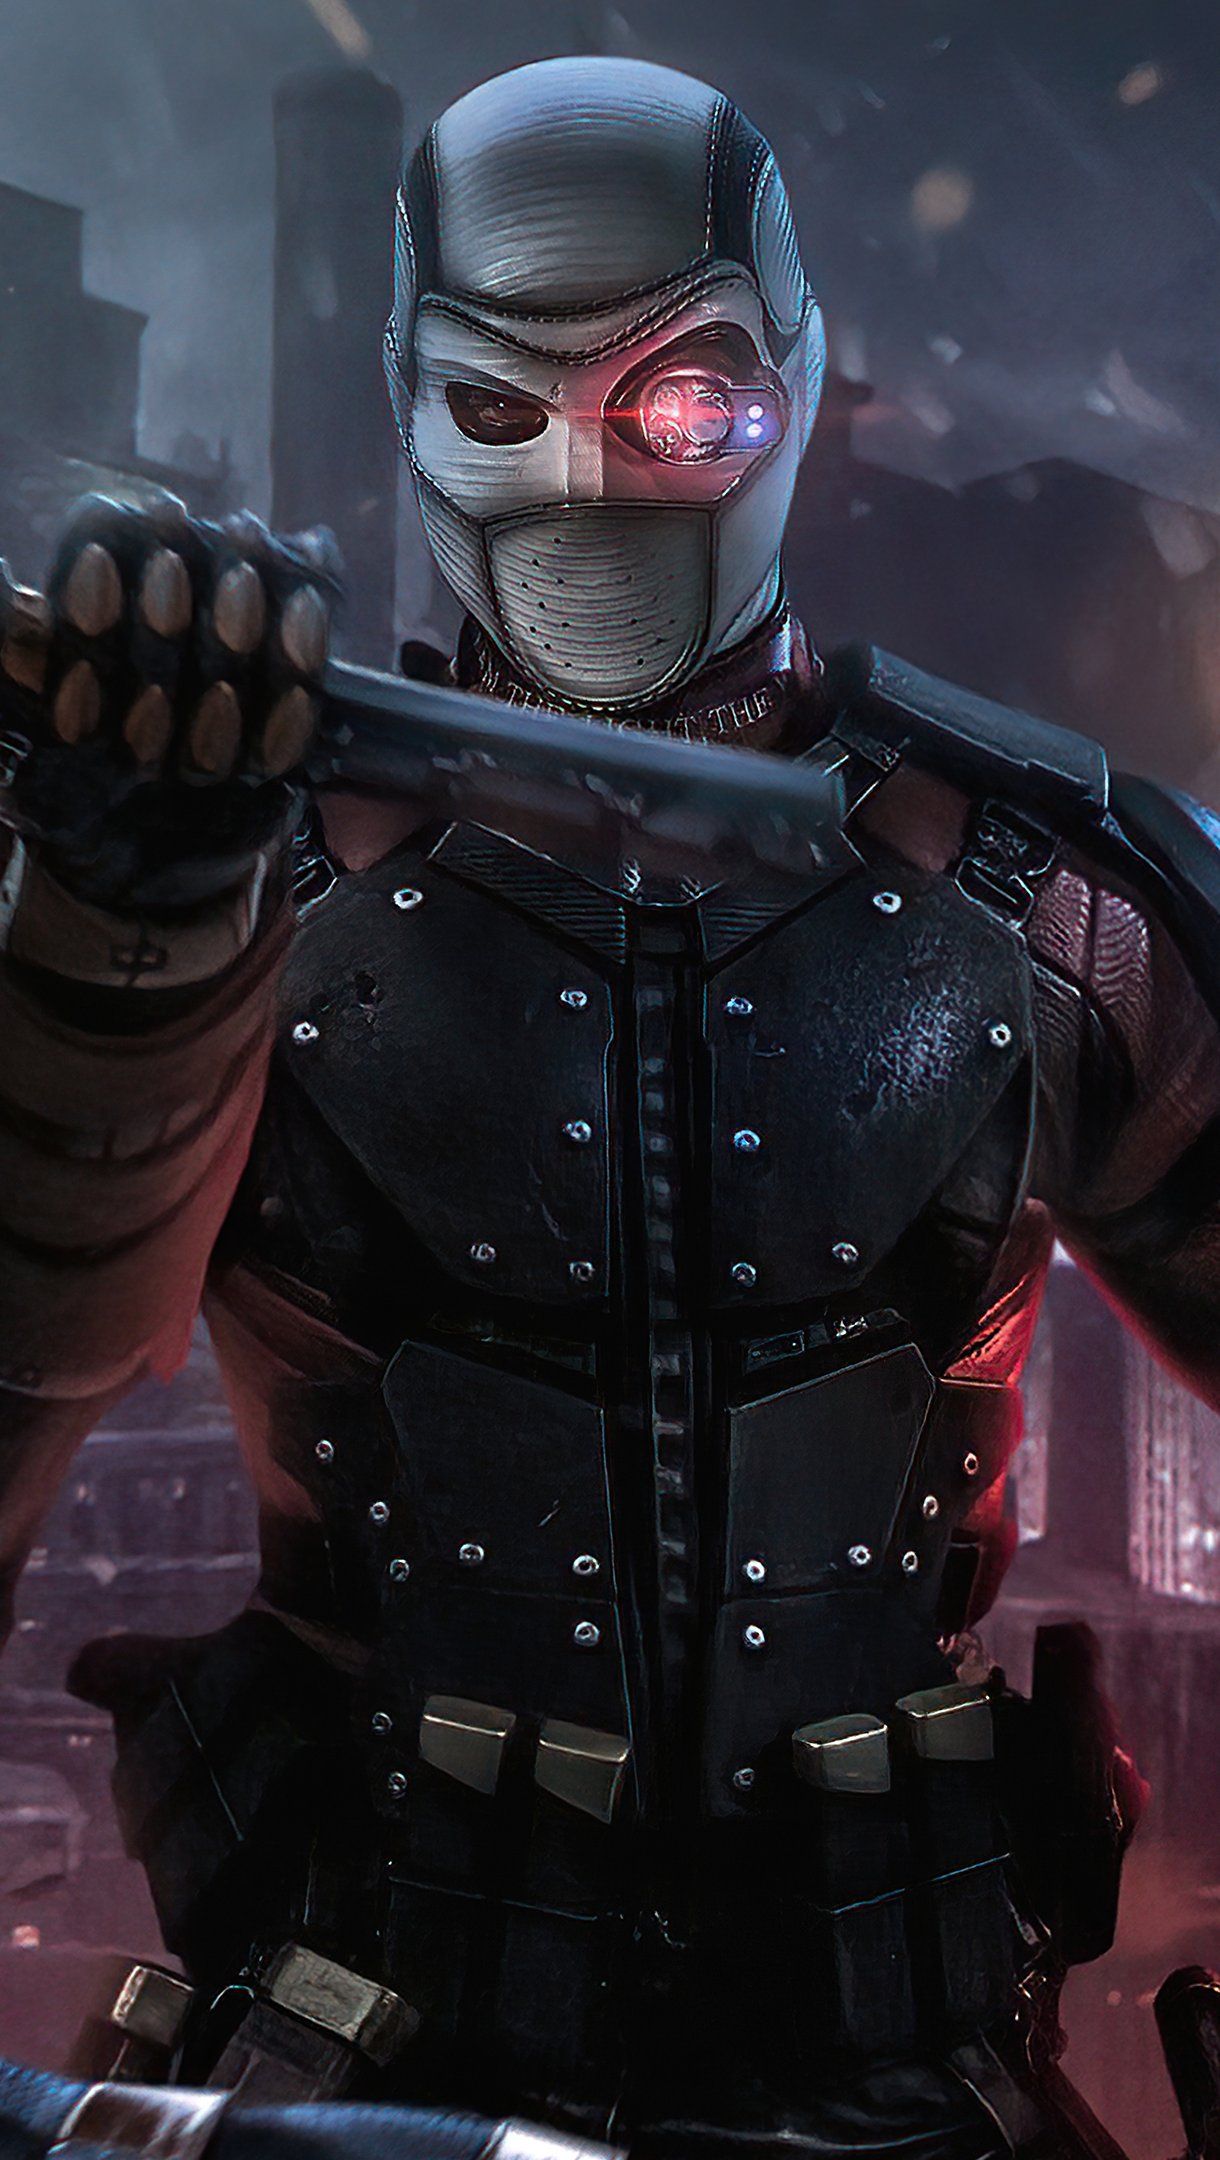 Fondos de pantalla Pelea de Deathstroke vs Deadshot Vertical